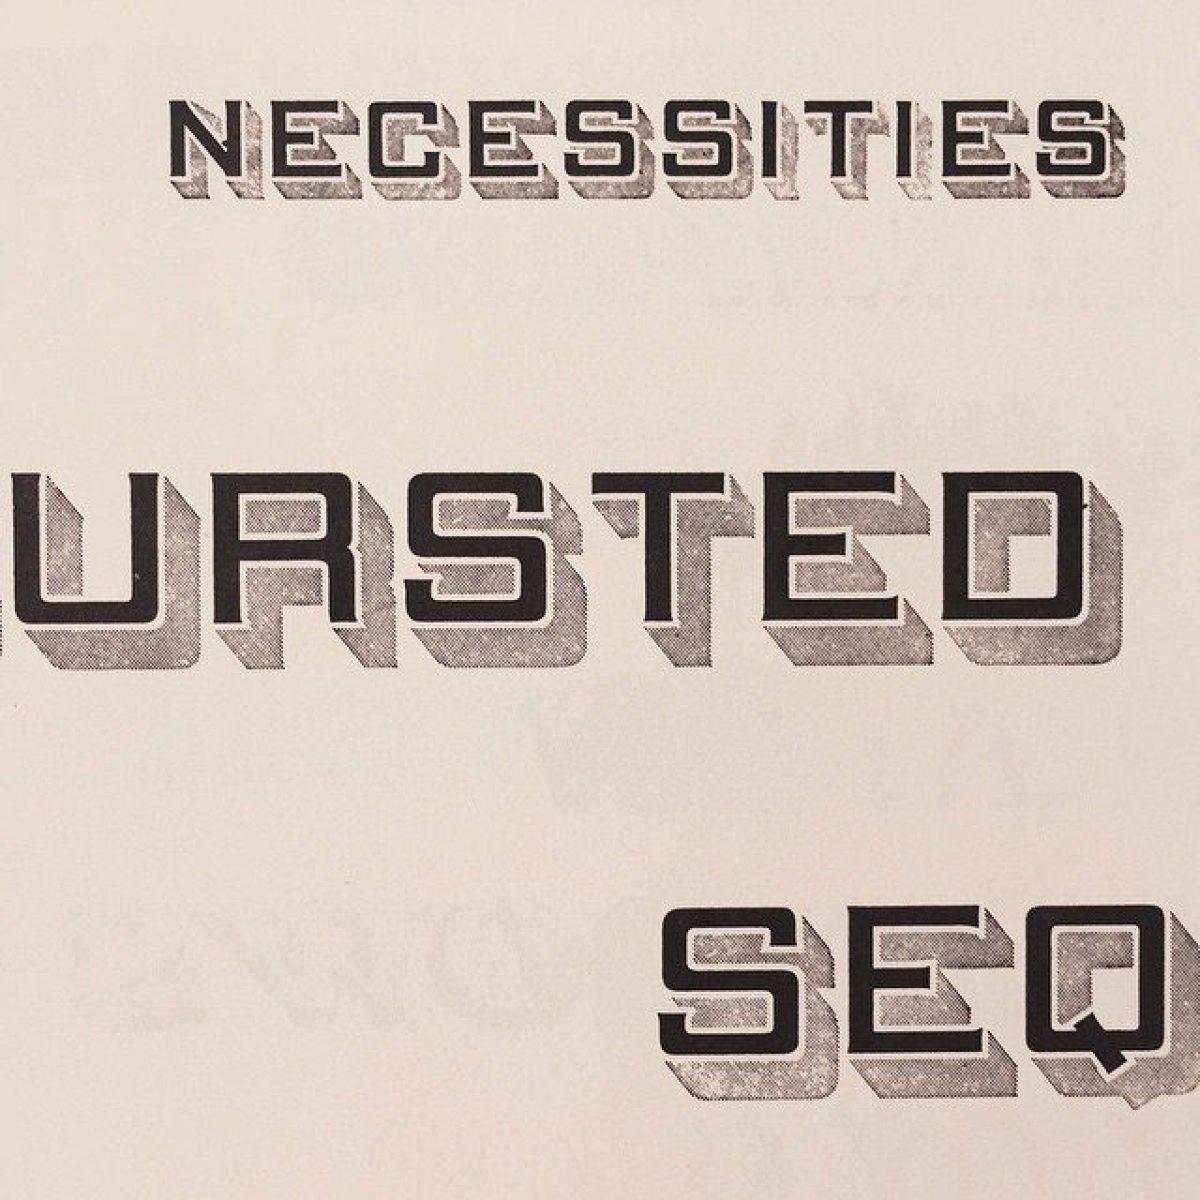 #type #typebook #typeface #typography #typespecimen #graphic #graphicdesign #graphicdesignagency #design #designagency